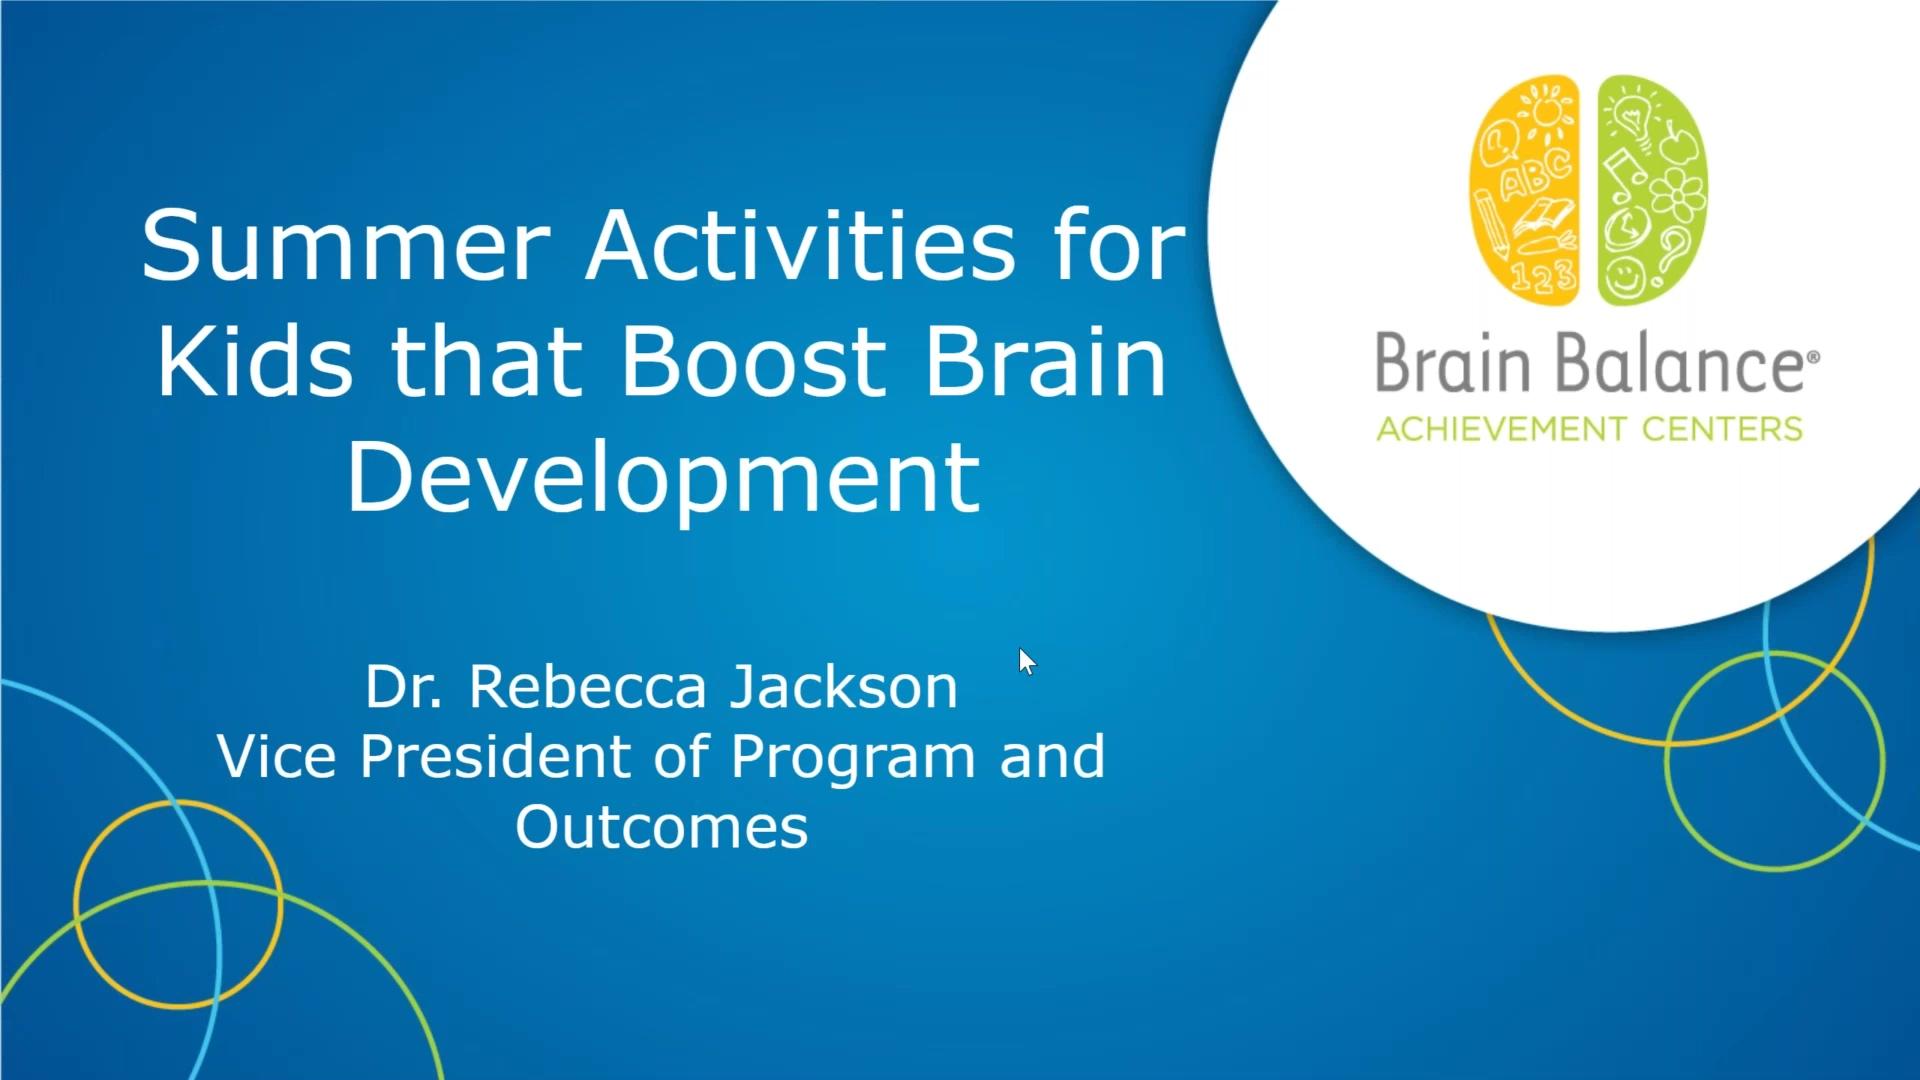 Summer Activities for Kids that Boost Brain Development